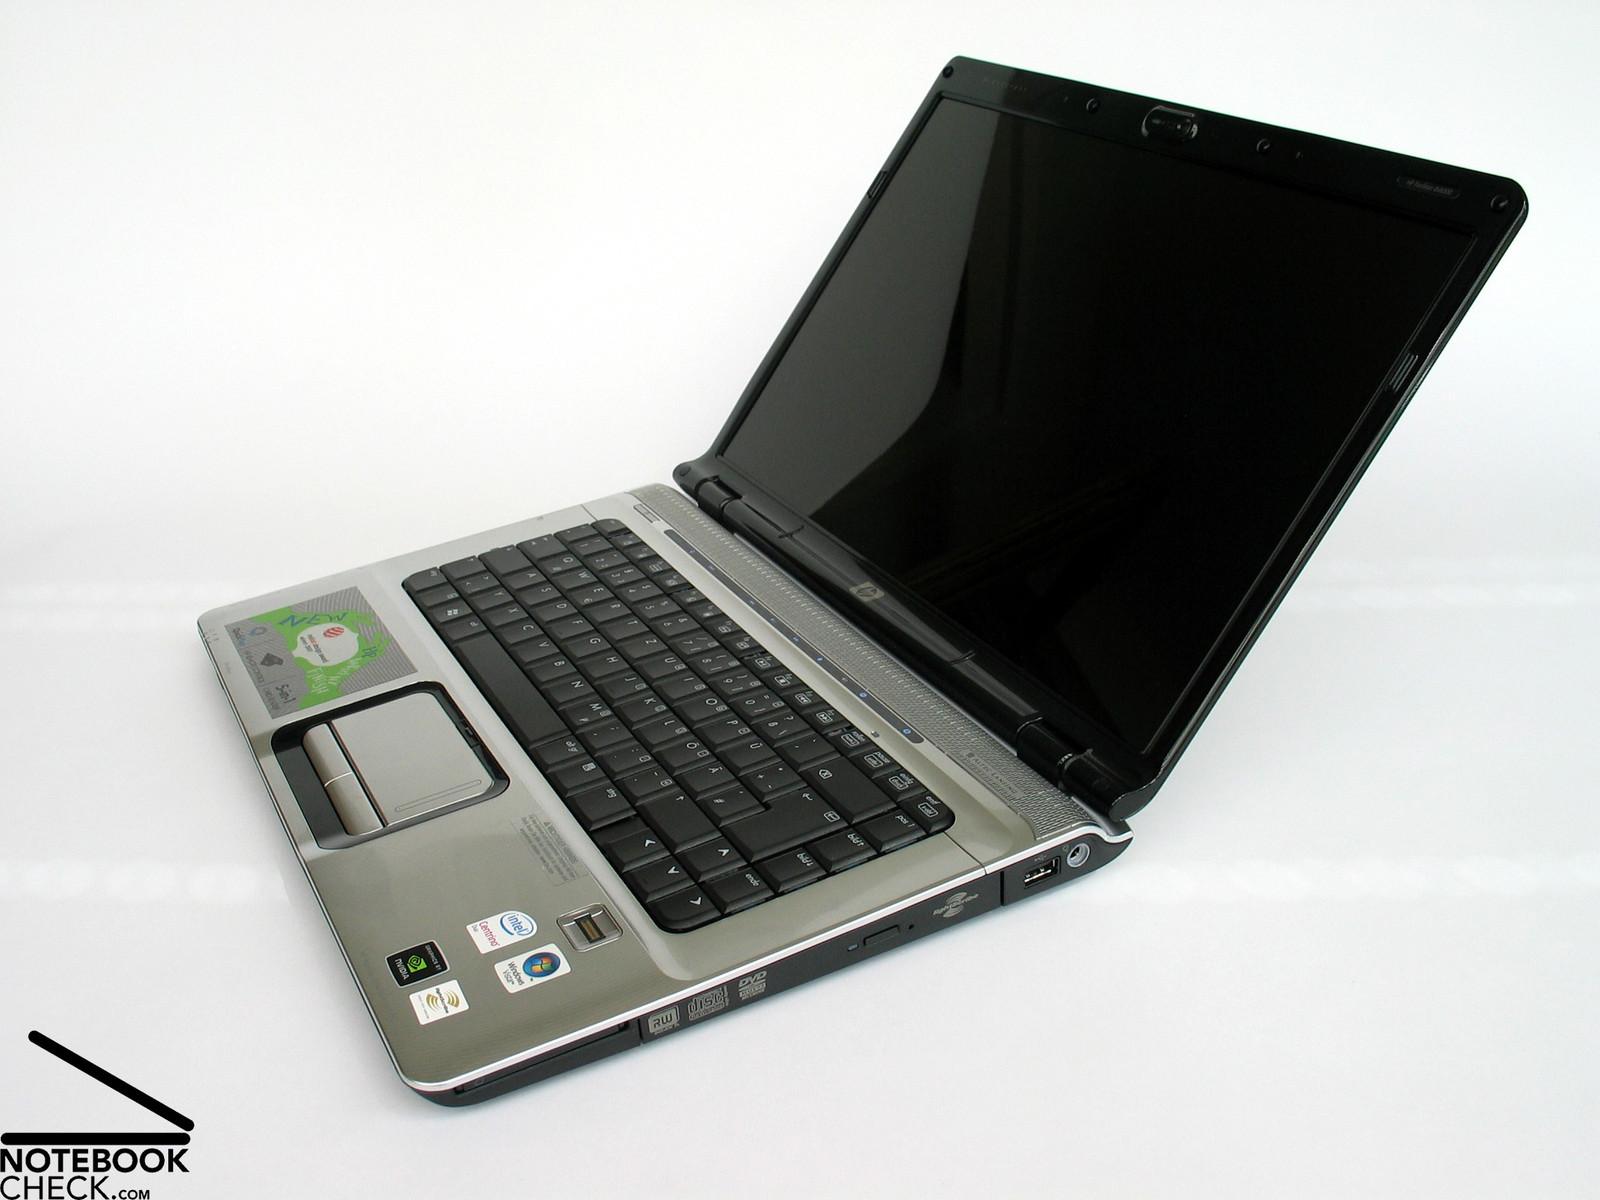 Review HP Pavilion Dv6598eg Notebook